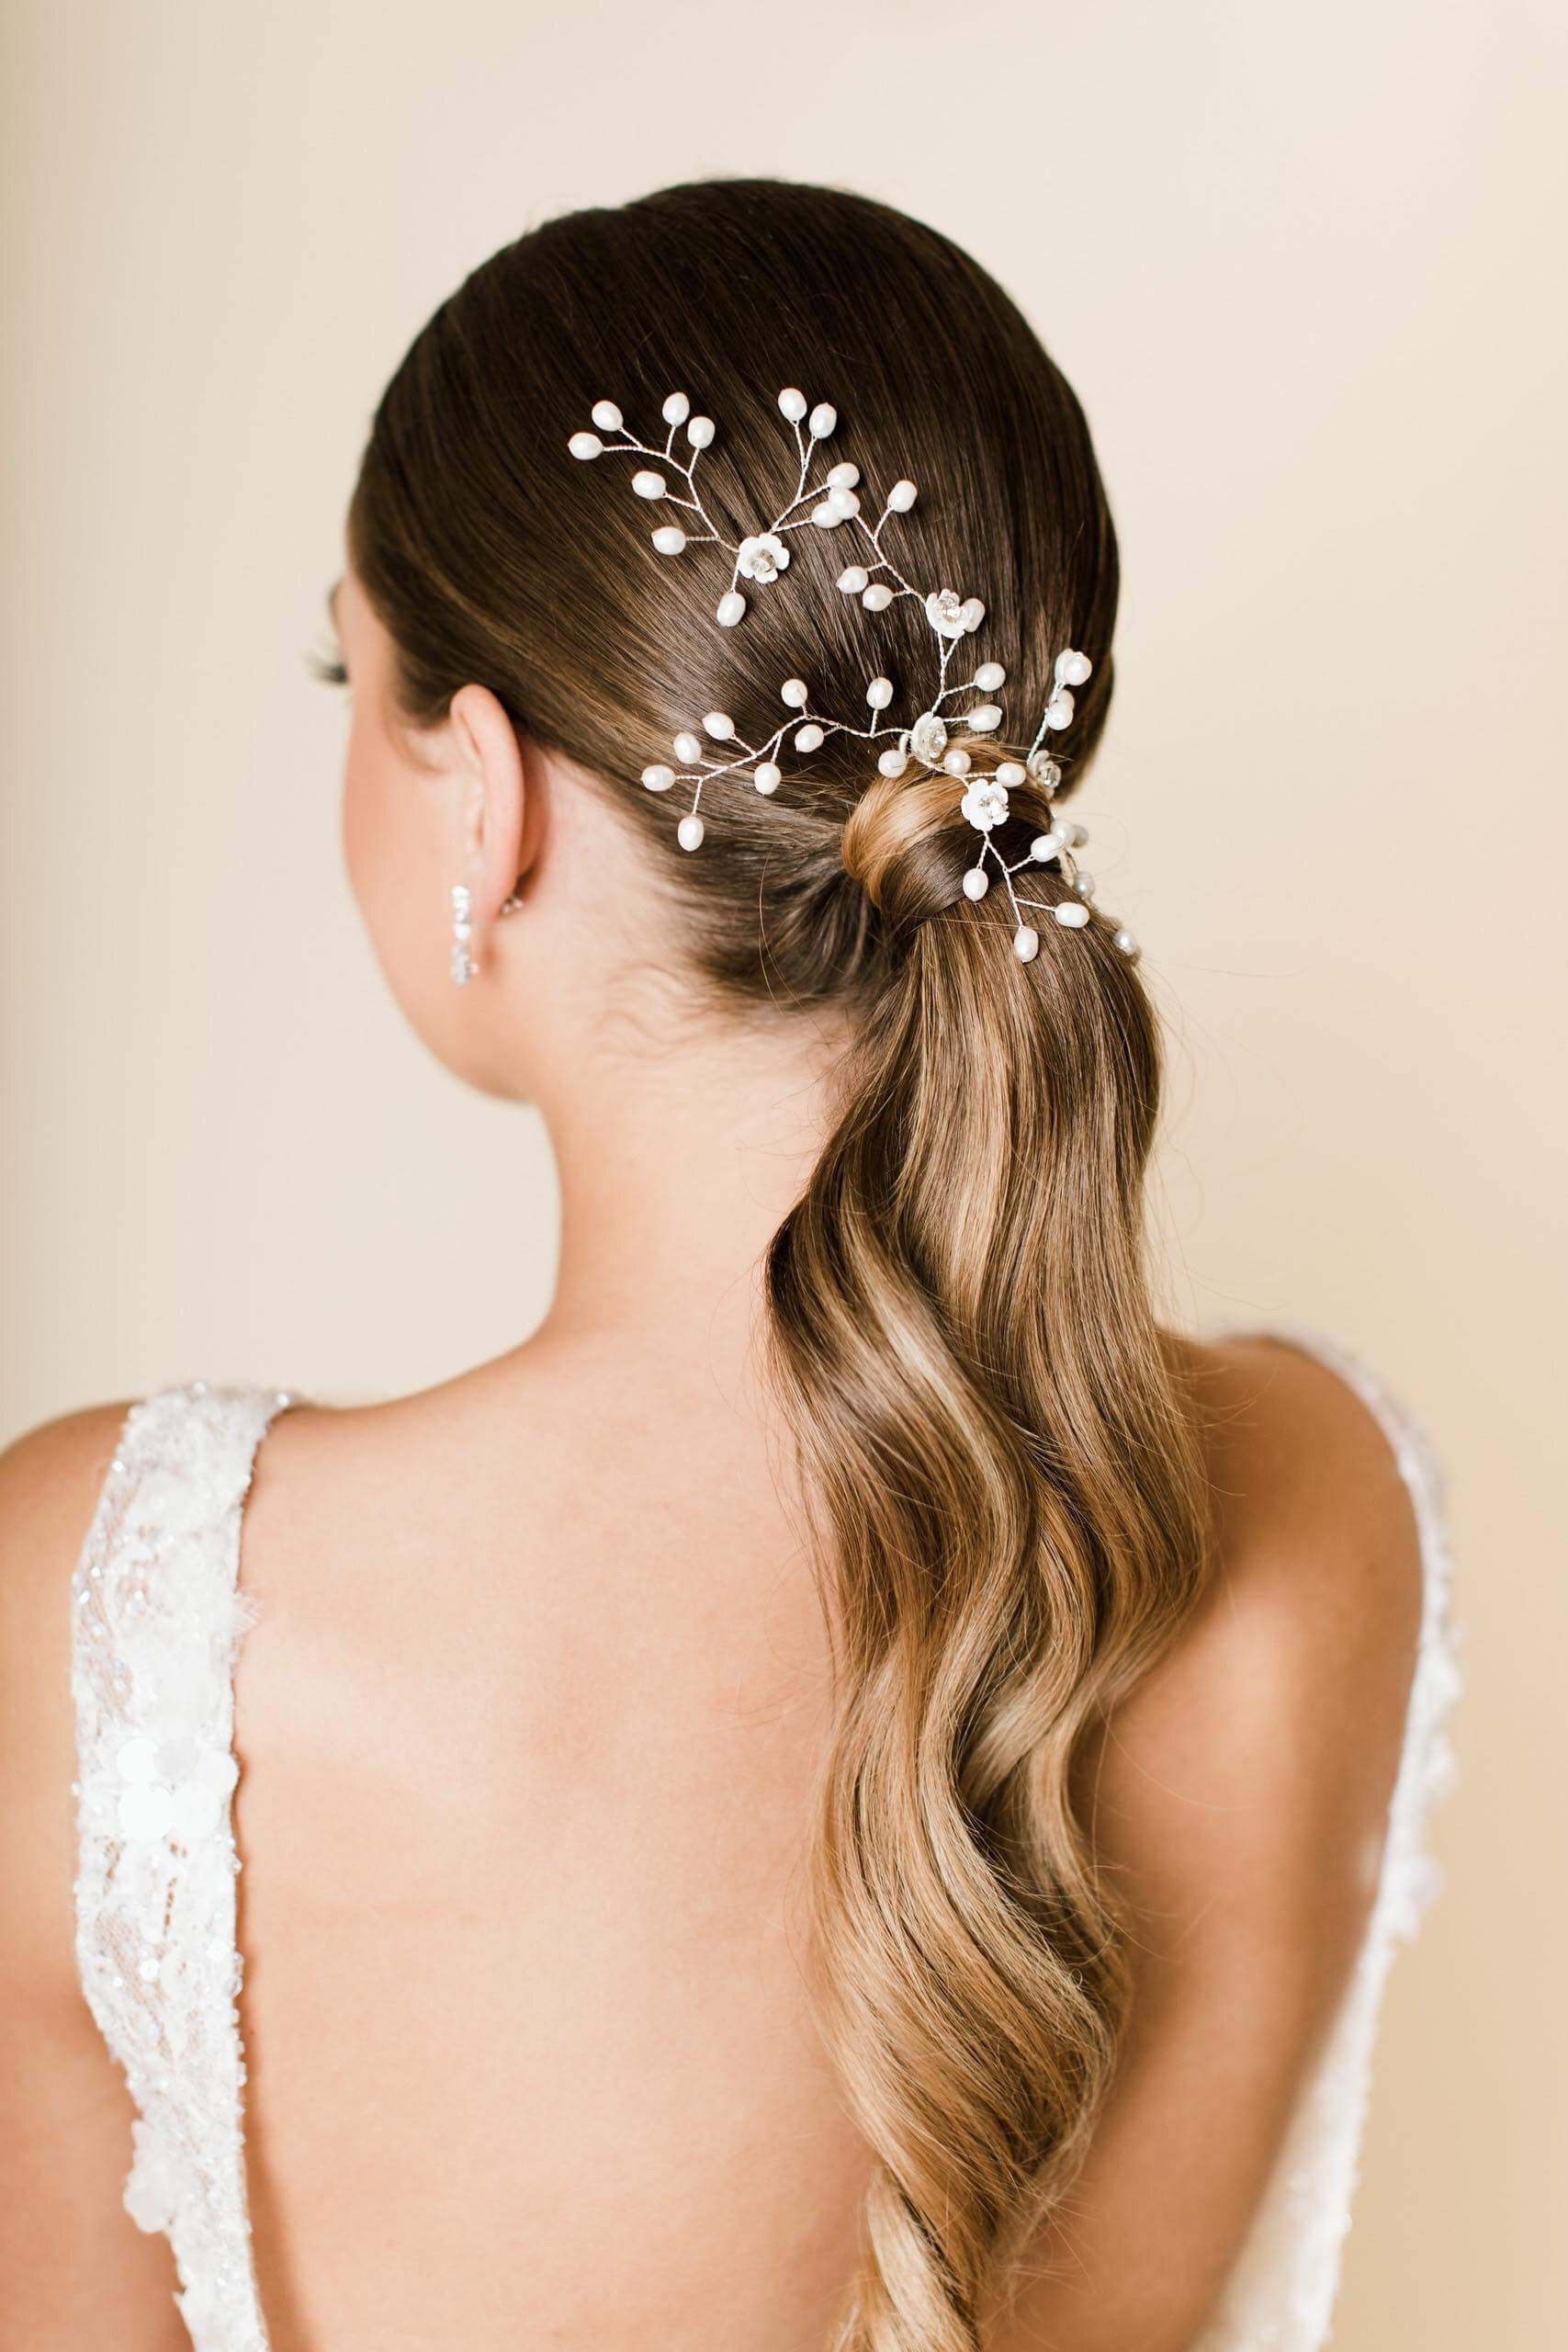 pin by botias hair, makeup, accessories on botias hair and